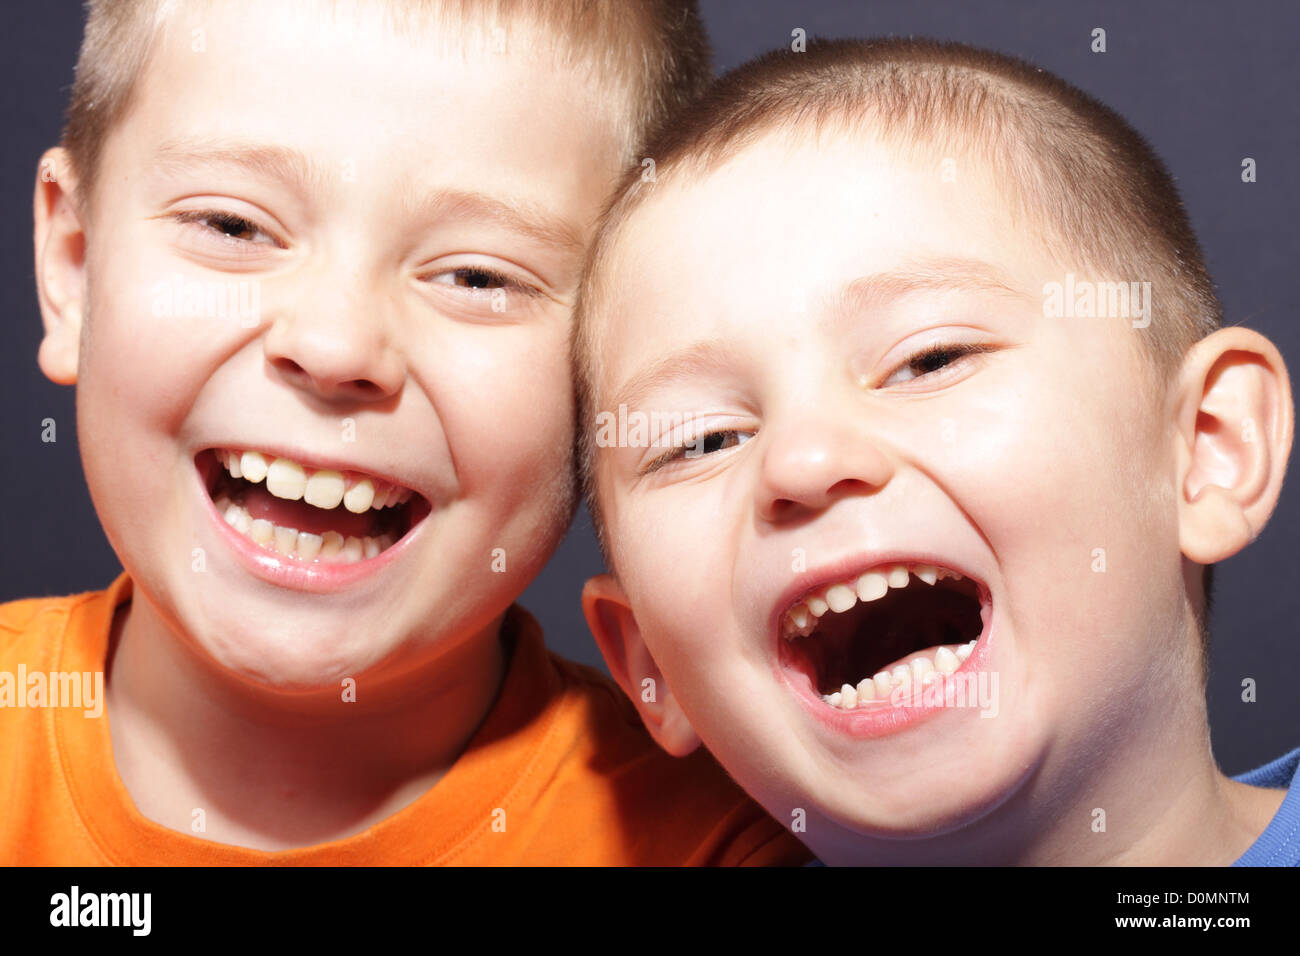 Laughing aloud - Stock Image